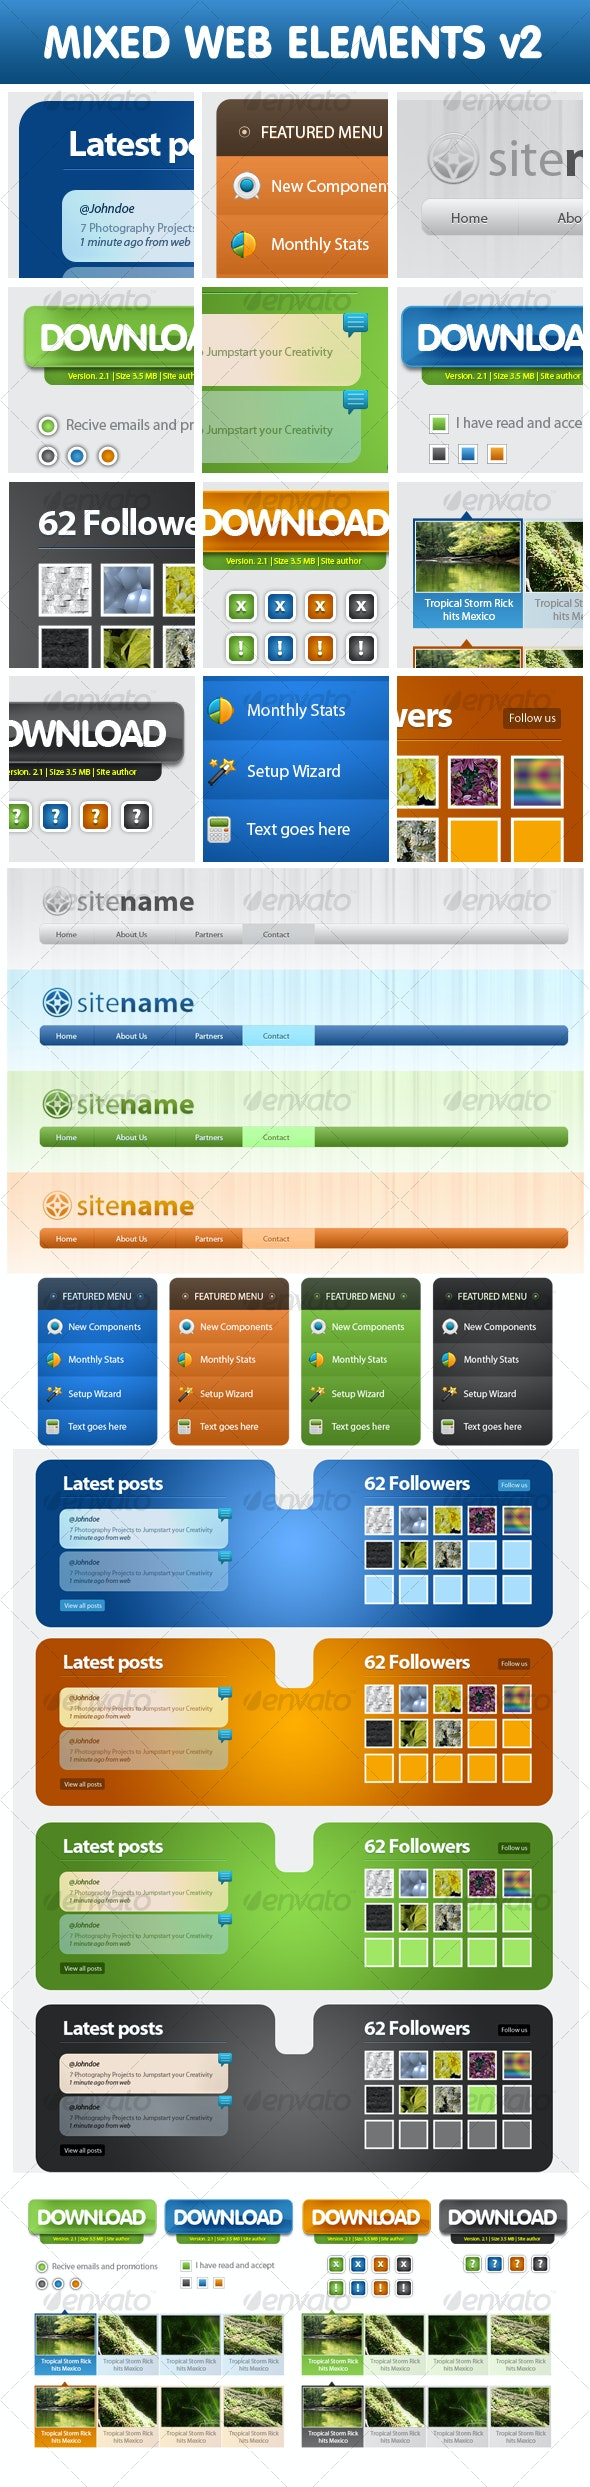 Mixed Web Elements v2 - Web Elements